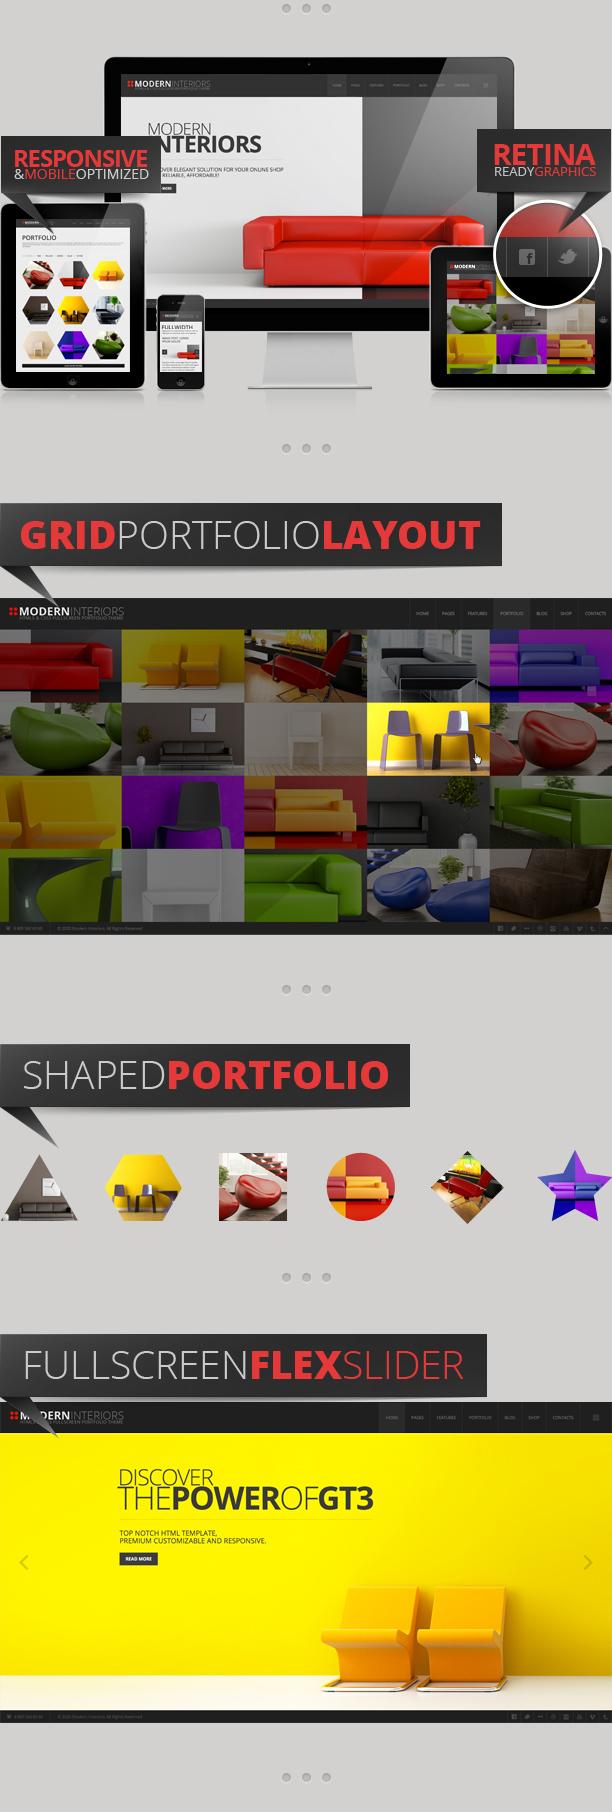 Modern Interior Responsive Web Template